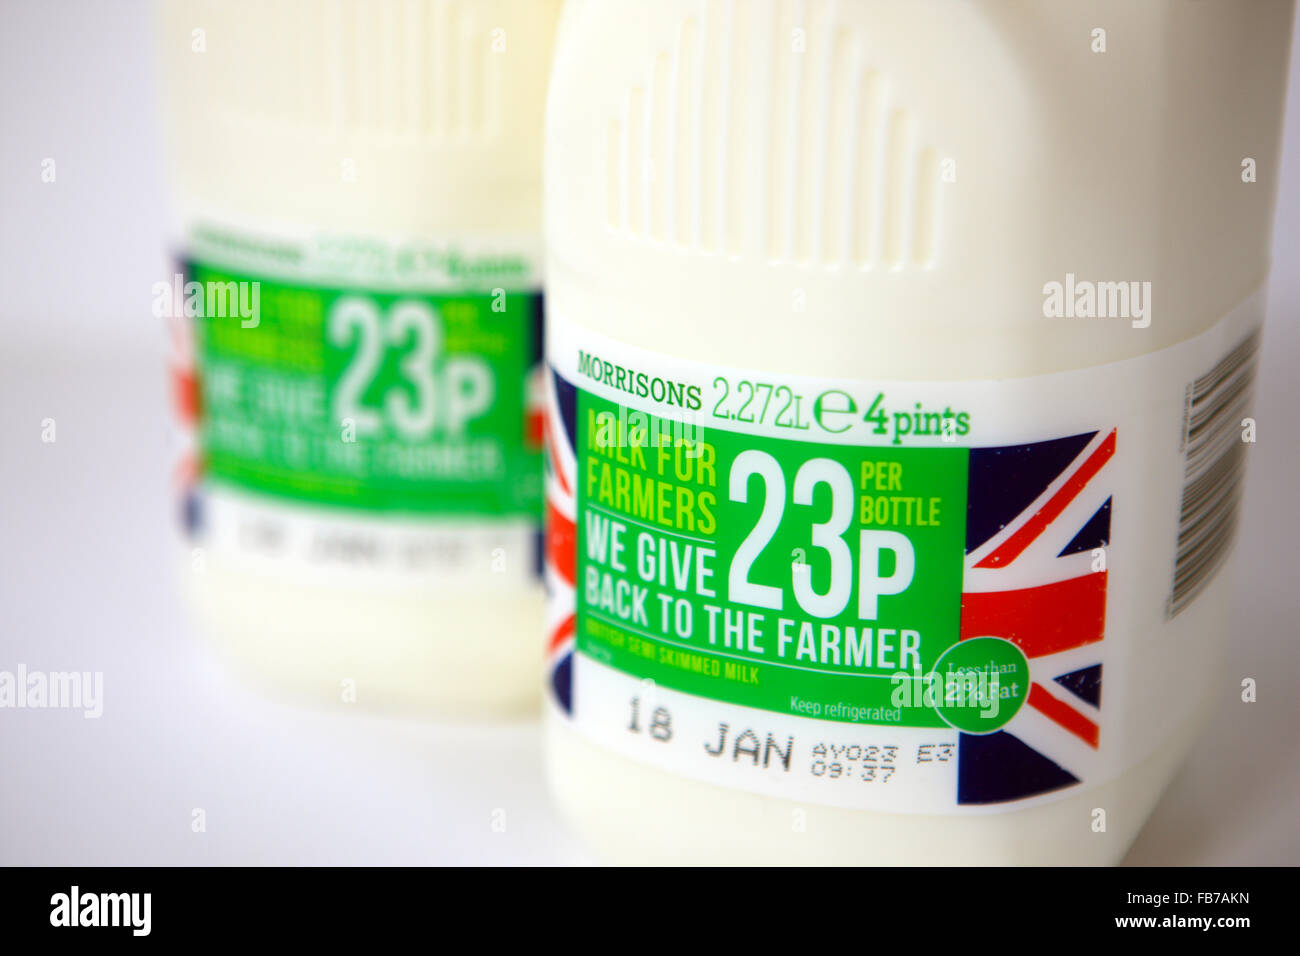 Mini Kühlschrank Für Milchtüte : Milchkartons stockfotos & milchkartons bilder alamy